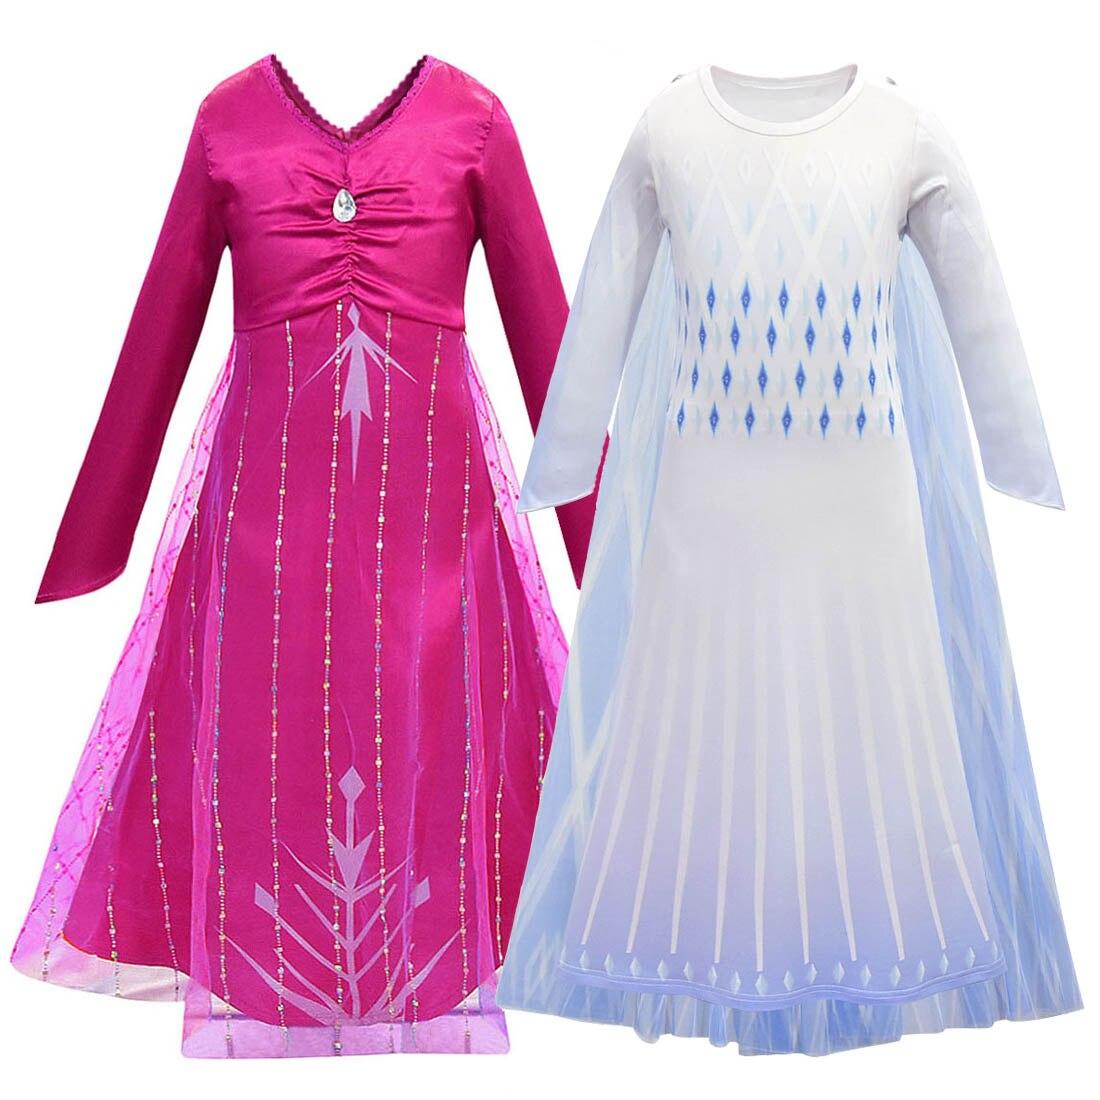 Elsa Cosplay Costume Kids Dresses For Girls Dress Snow Queen Princess Dresses Anna Costumes Party Fantasia Vestidos Clothing